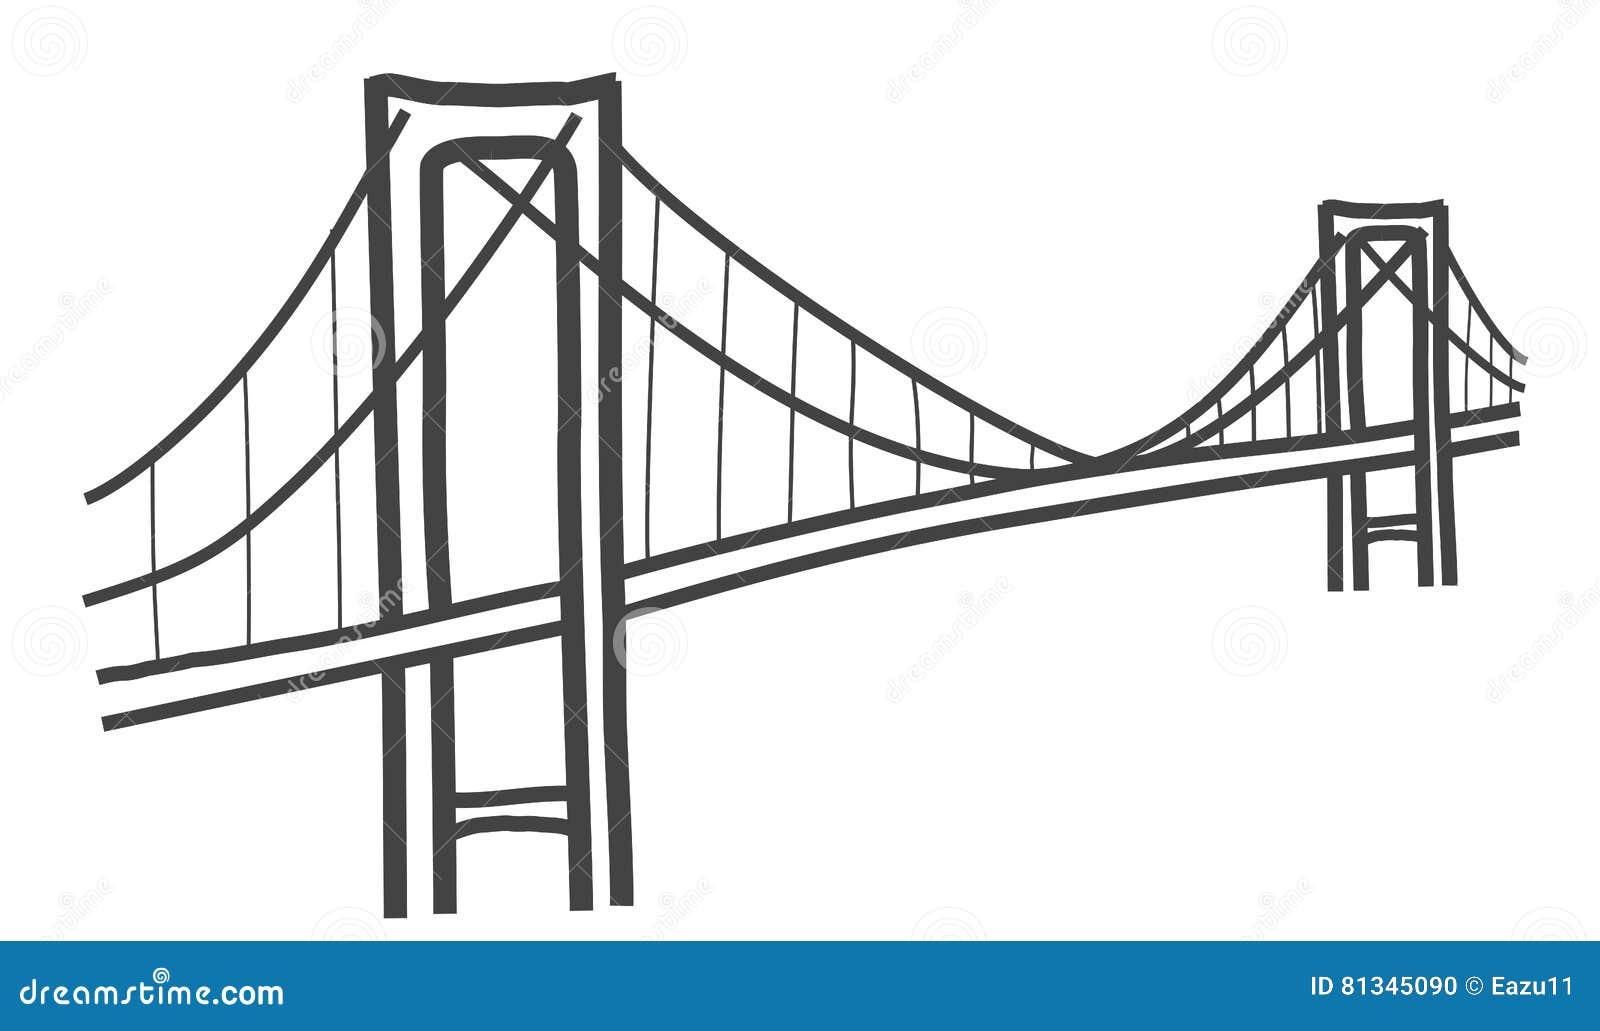 cable bridge drawing royalty